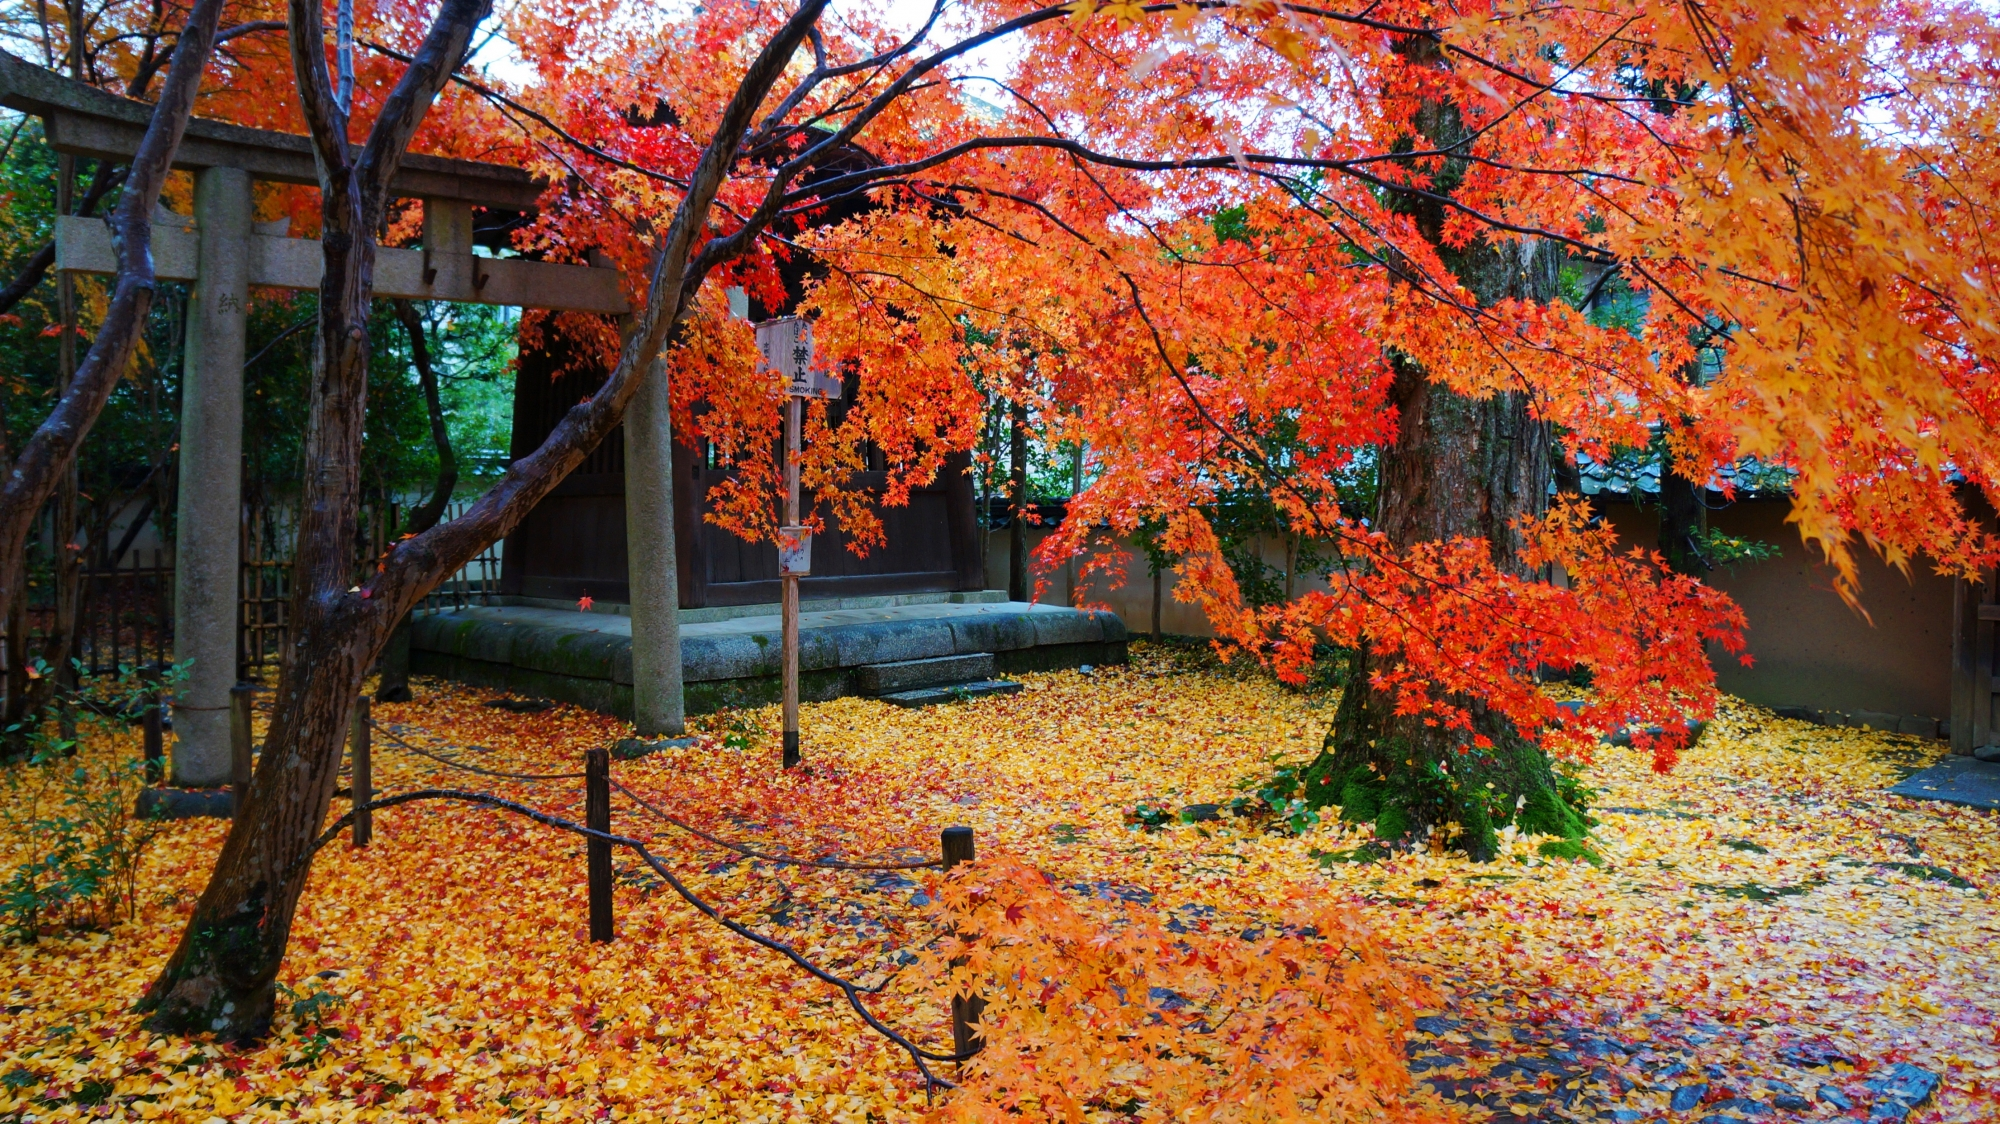 蓮華寺の鐘楼の紅葉